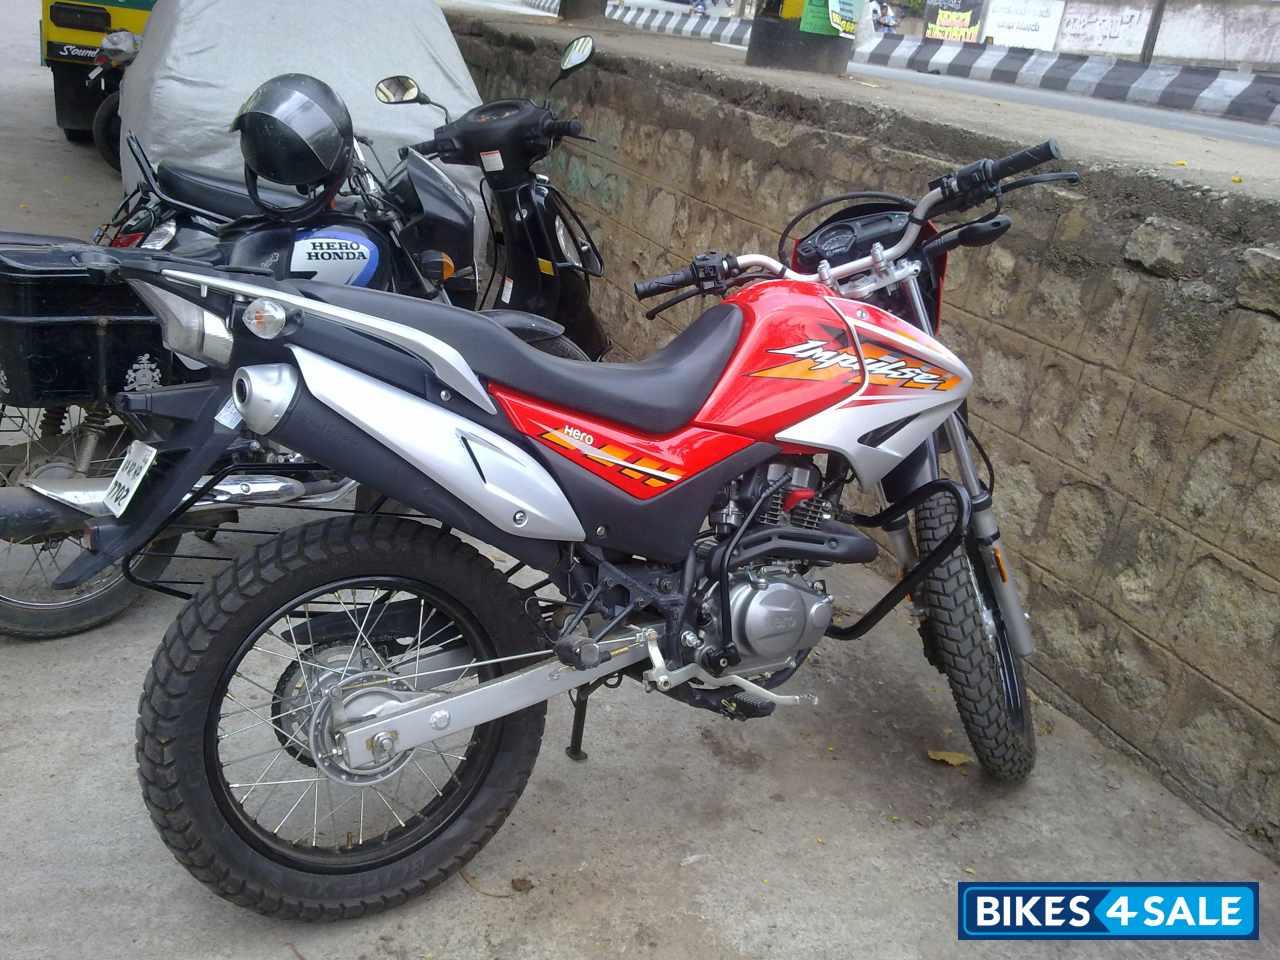 hero impulse for sale in bangalore dating